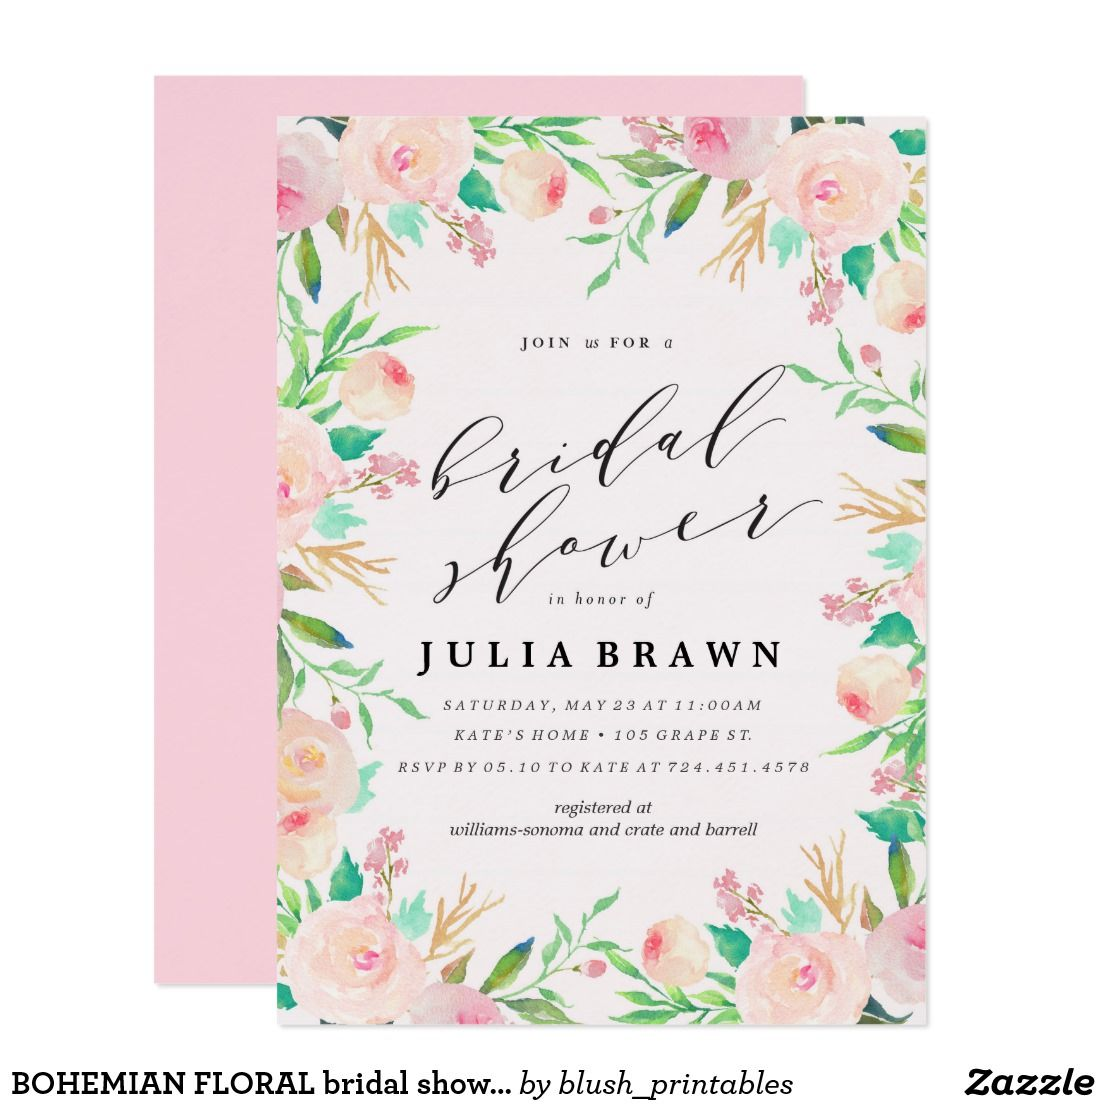 BOHEMIAN FLORAL bridal shower invitation | Bridal Shower Invitations ...